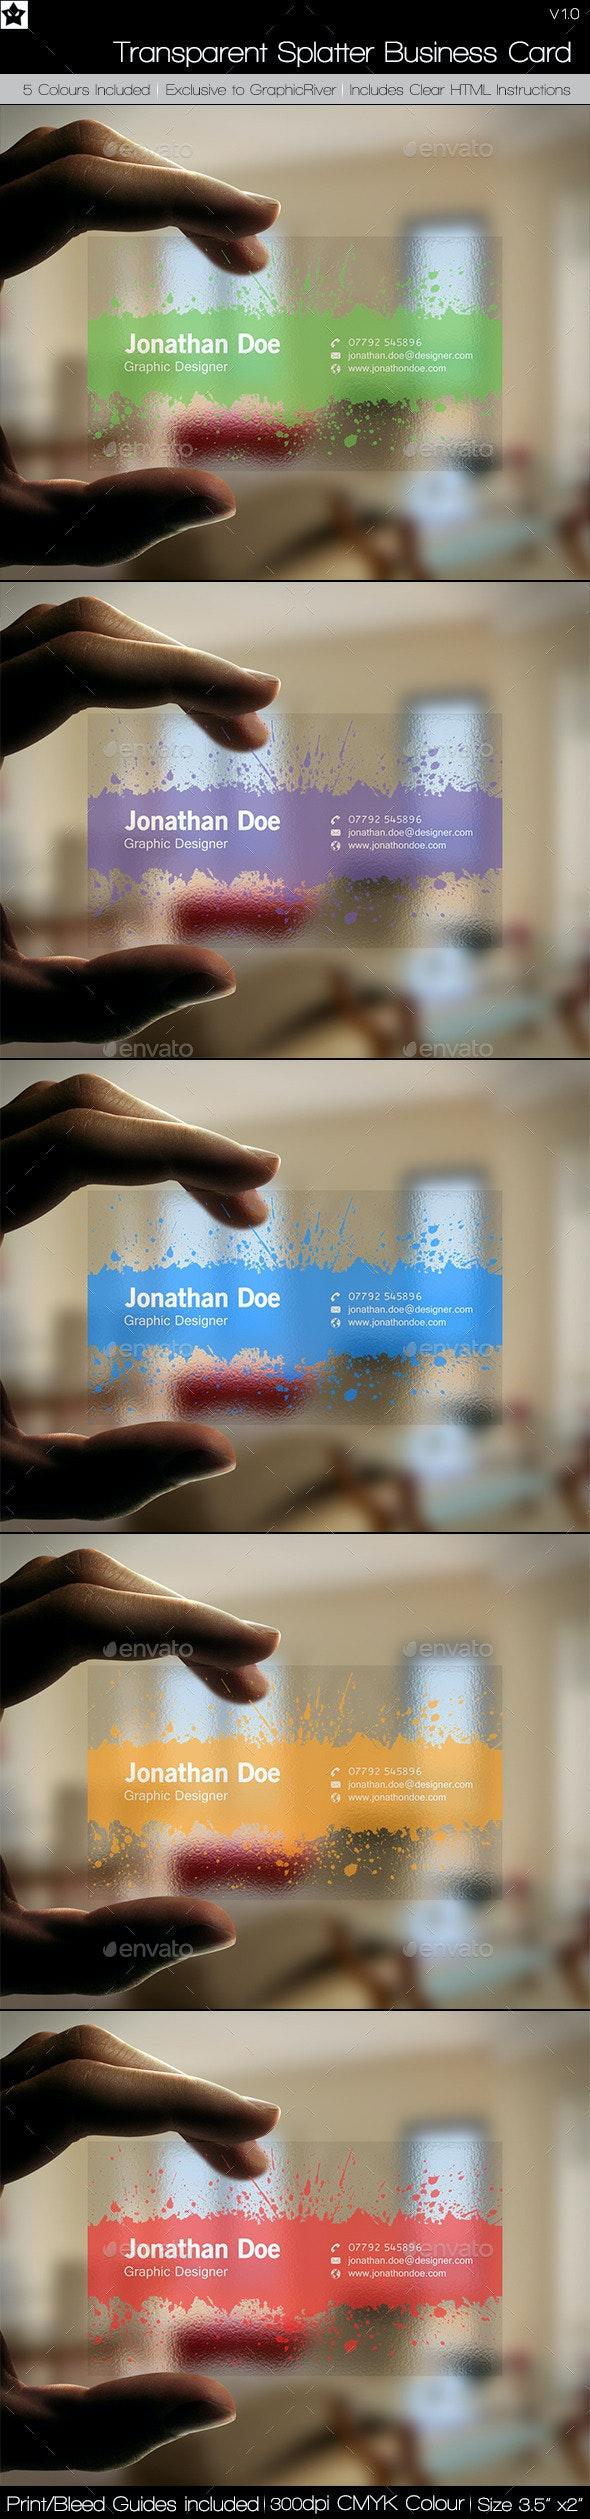 Transparent Splatter Business Cards - Creative Business Cards